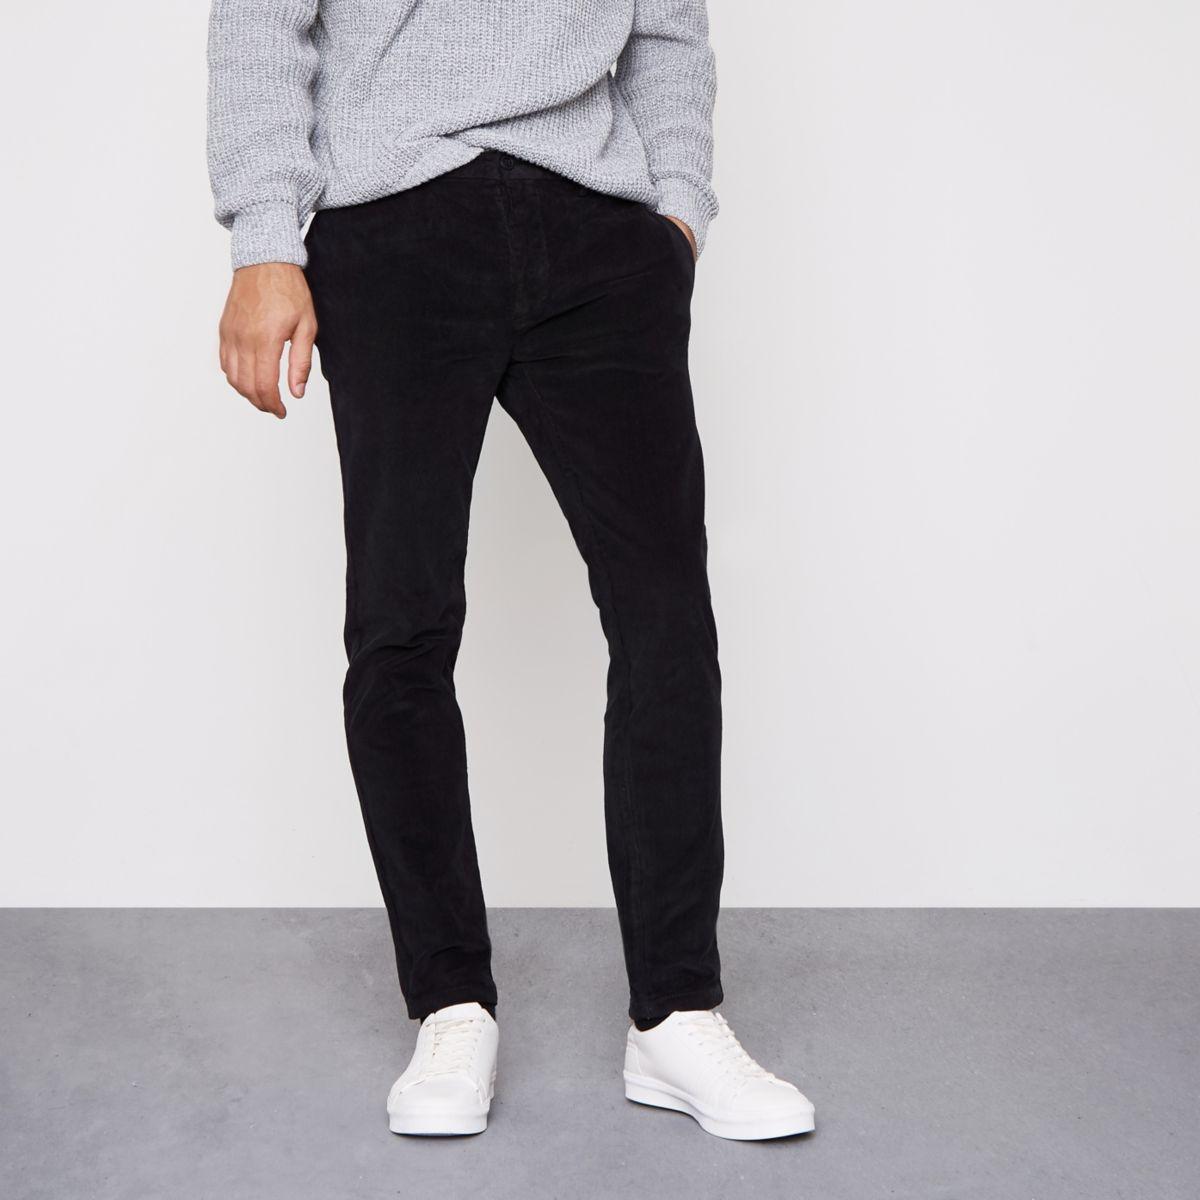 Black cord skinny smart trousers